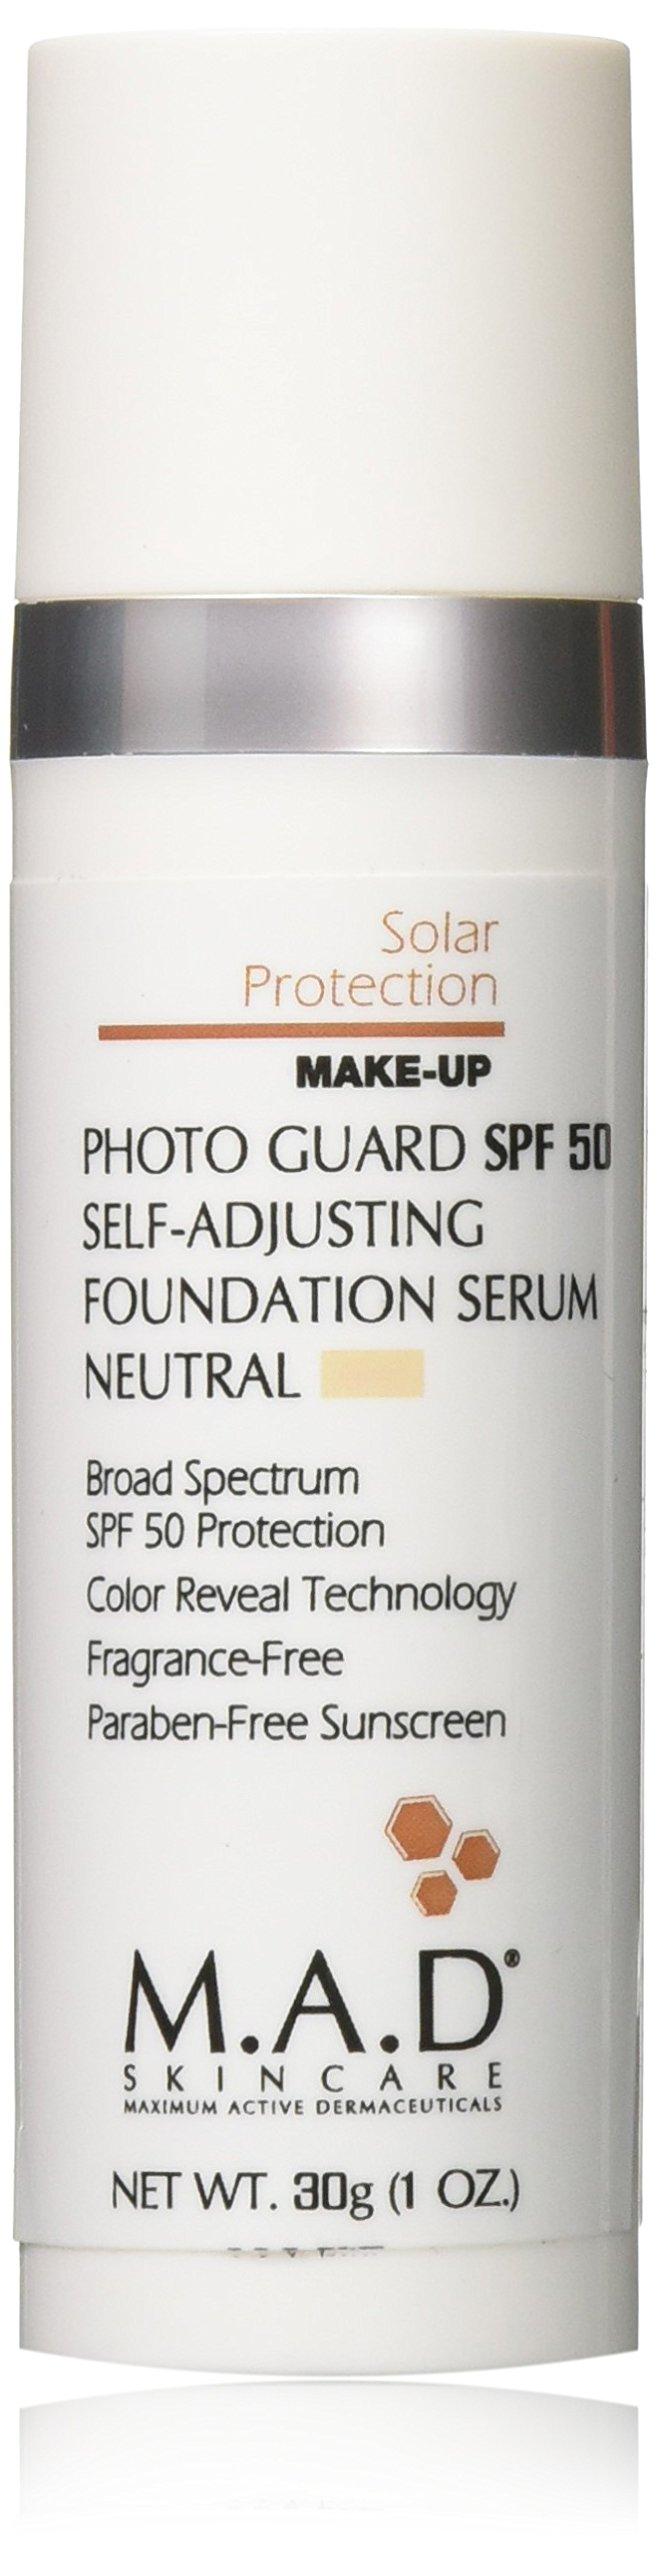 M.A.D SKINCARE SOLAR PROTECTION: Photo Guard SPF 50 Self-Adjusting Foundation Serum: Neutral - 30g